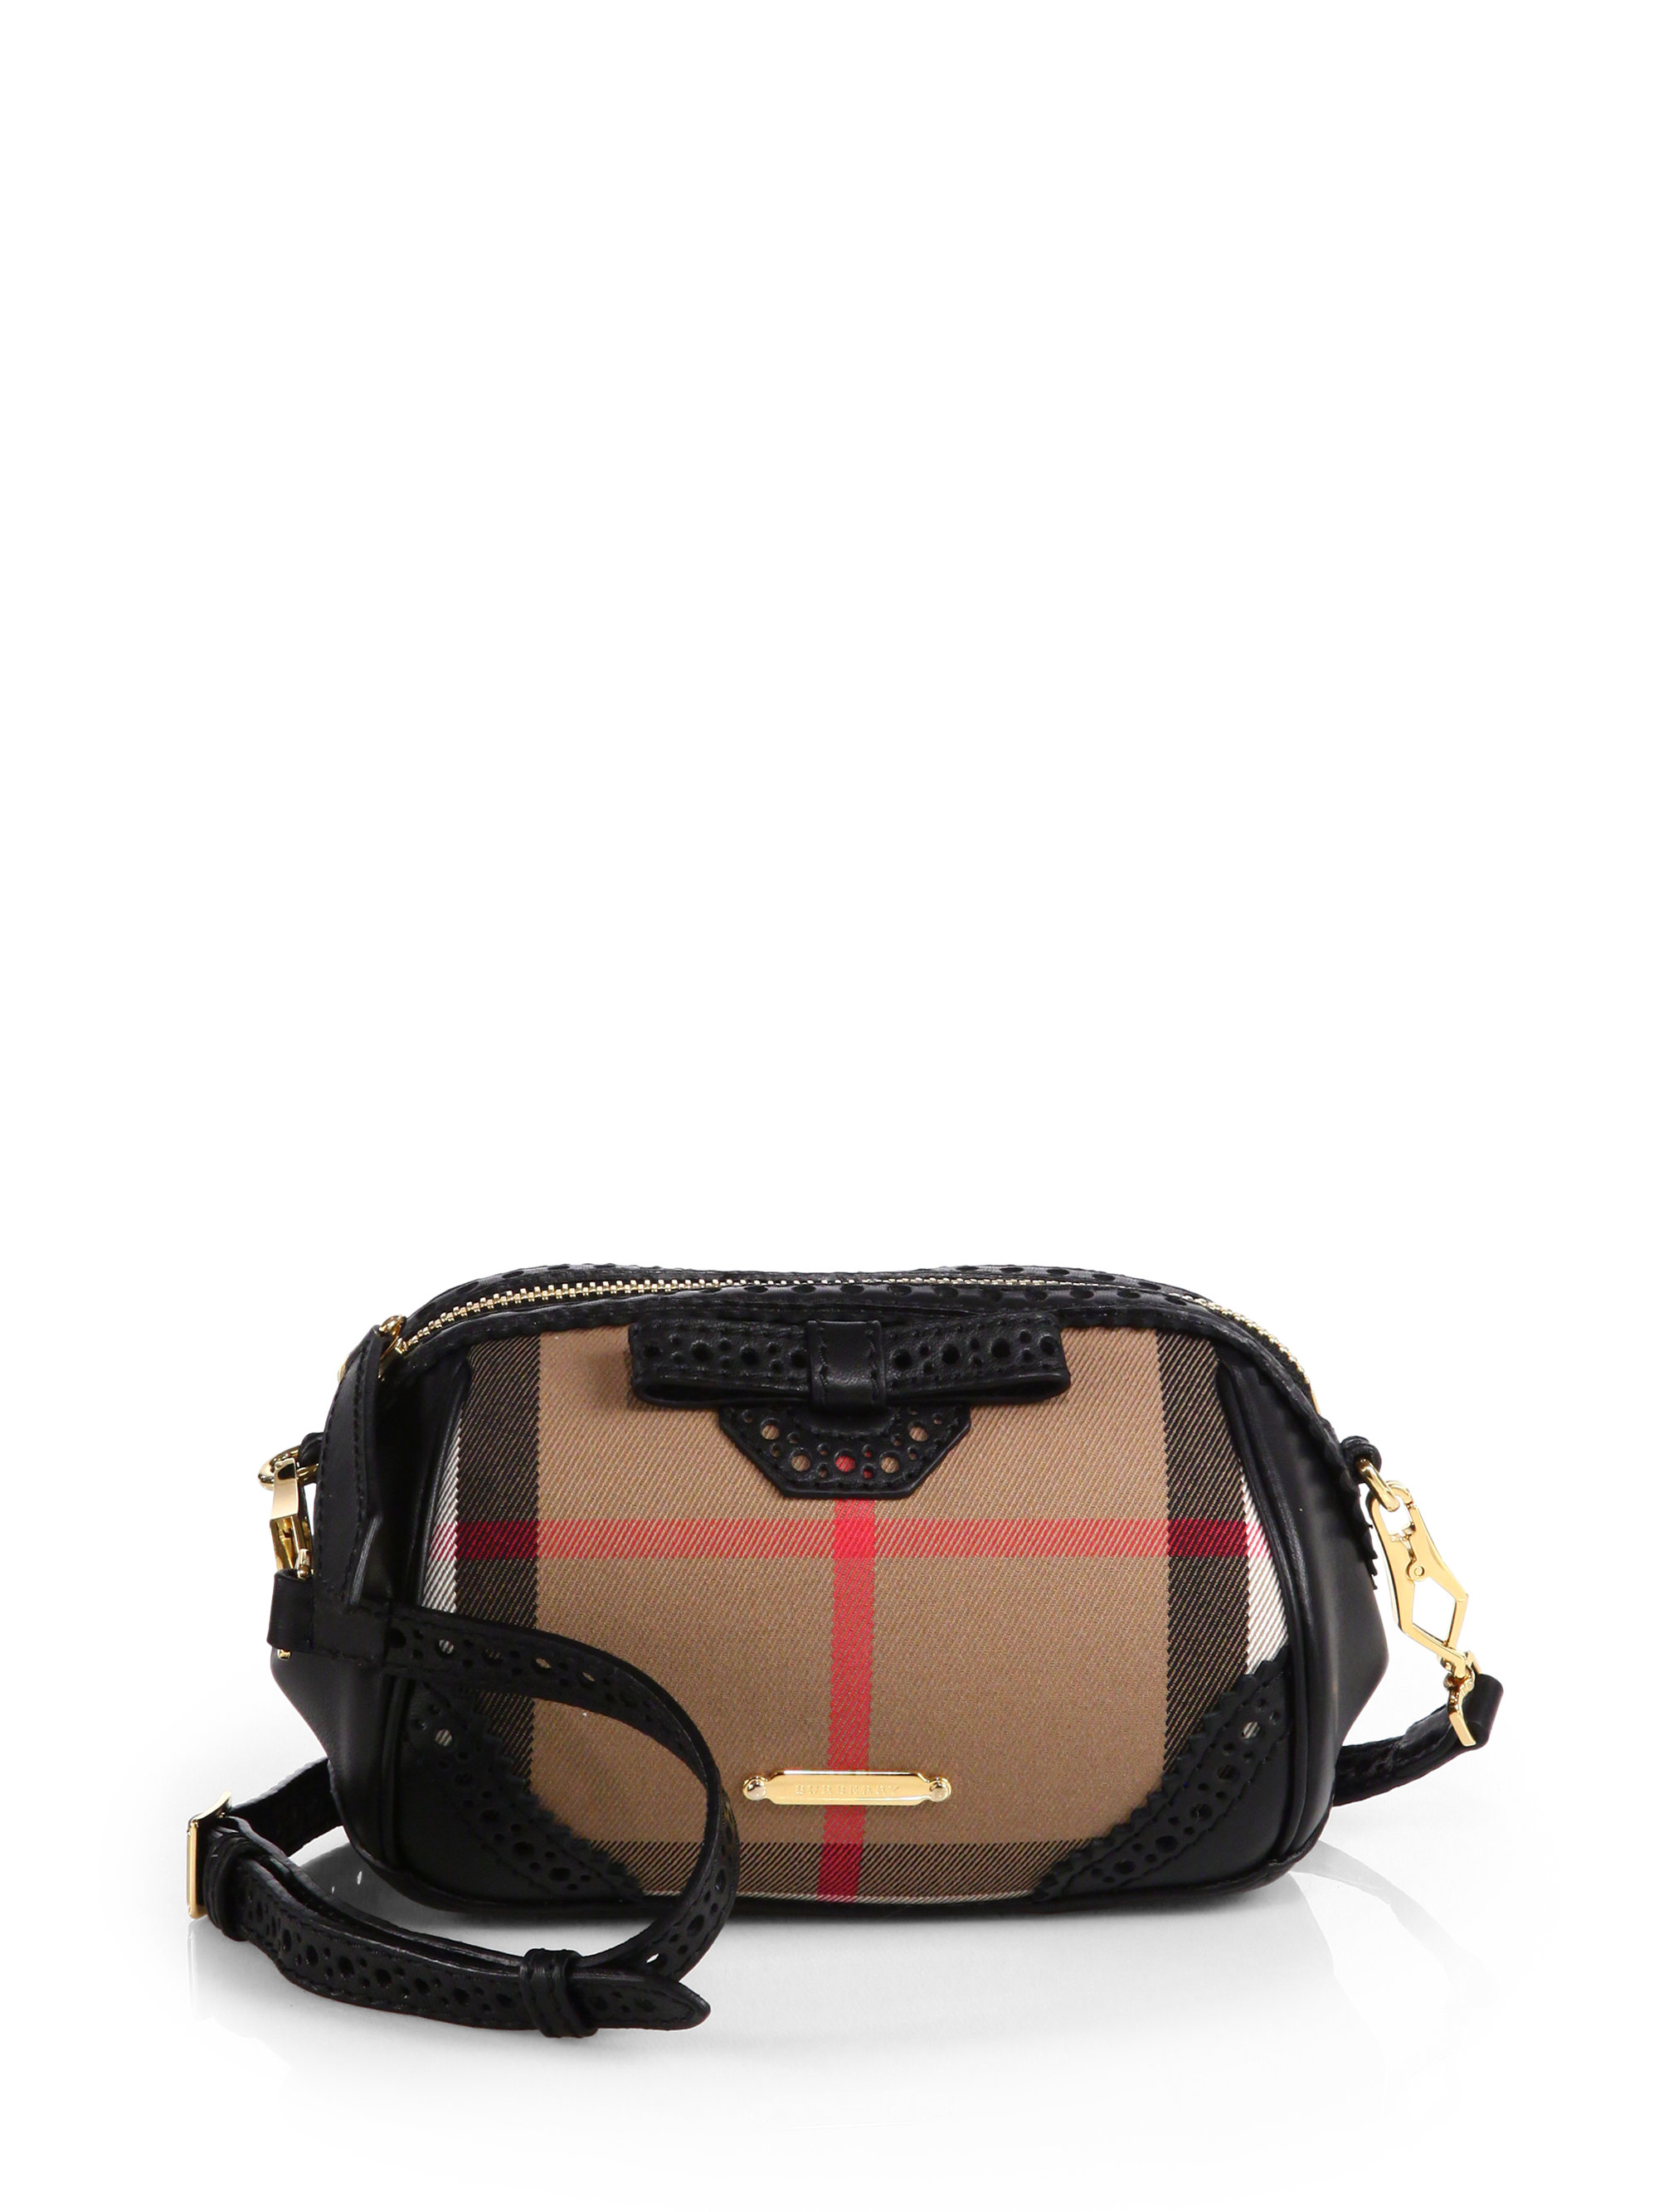 a842441c048d72 Burberry Blaze Haymarket Mixedmedia Crossbody Bag in Brown - Lyst